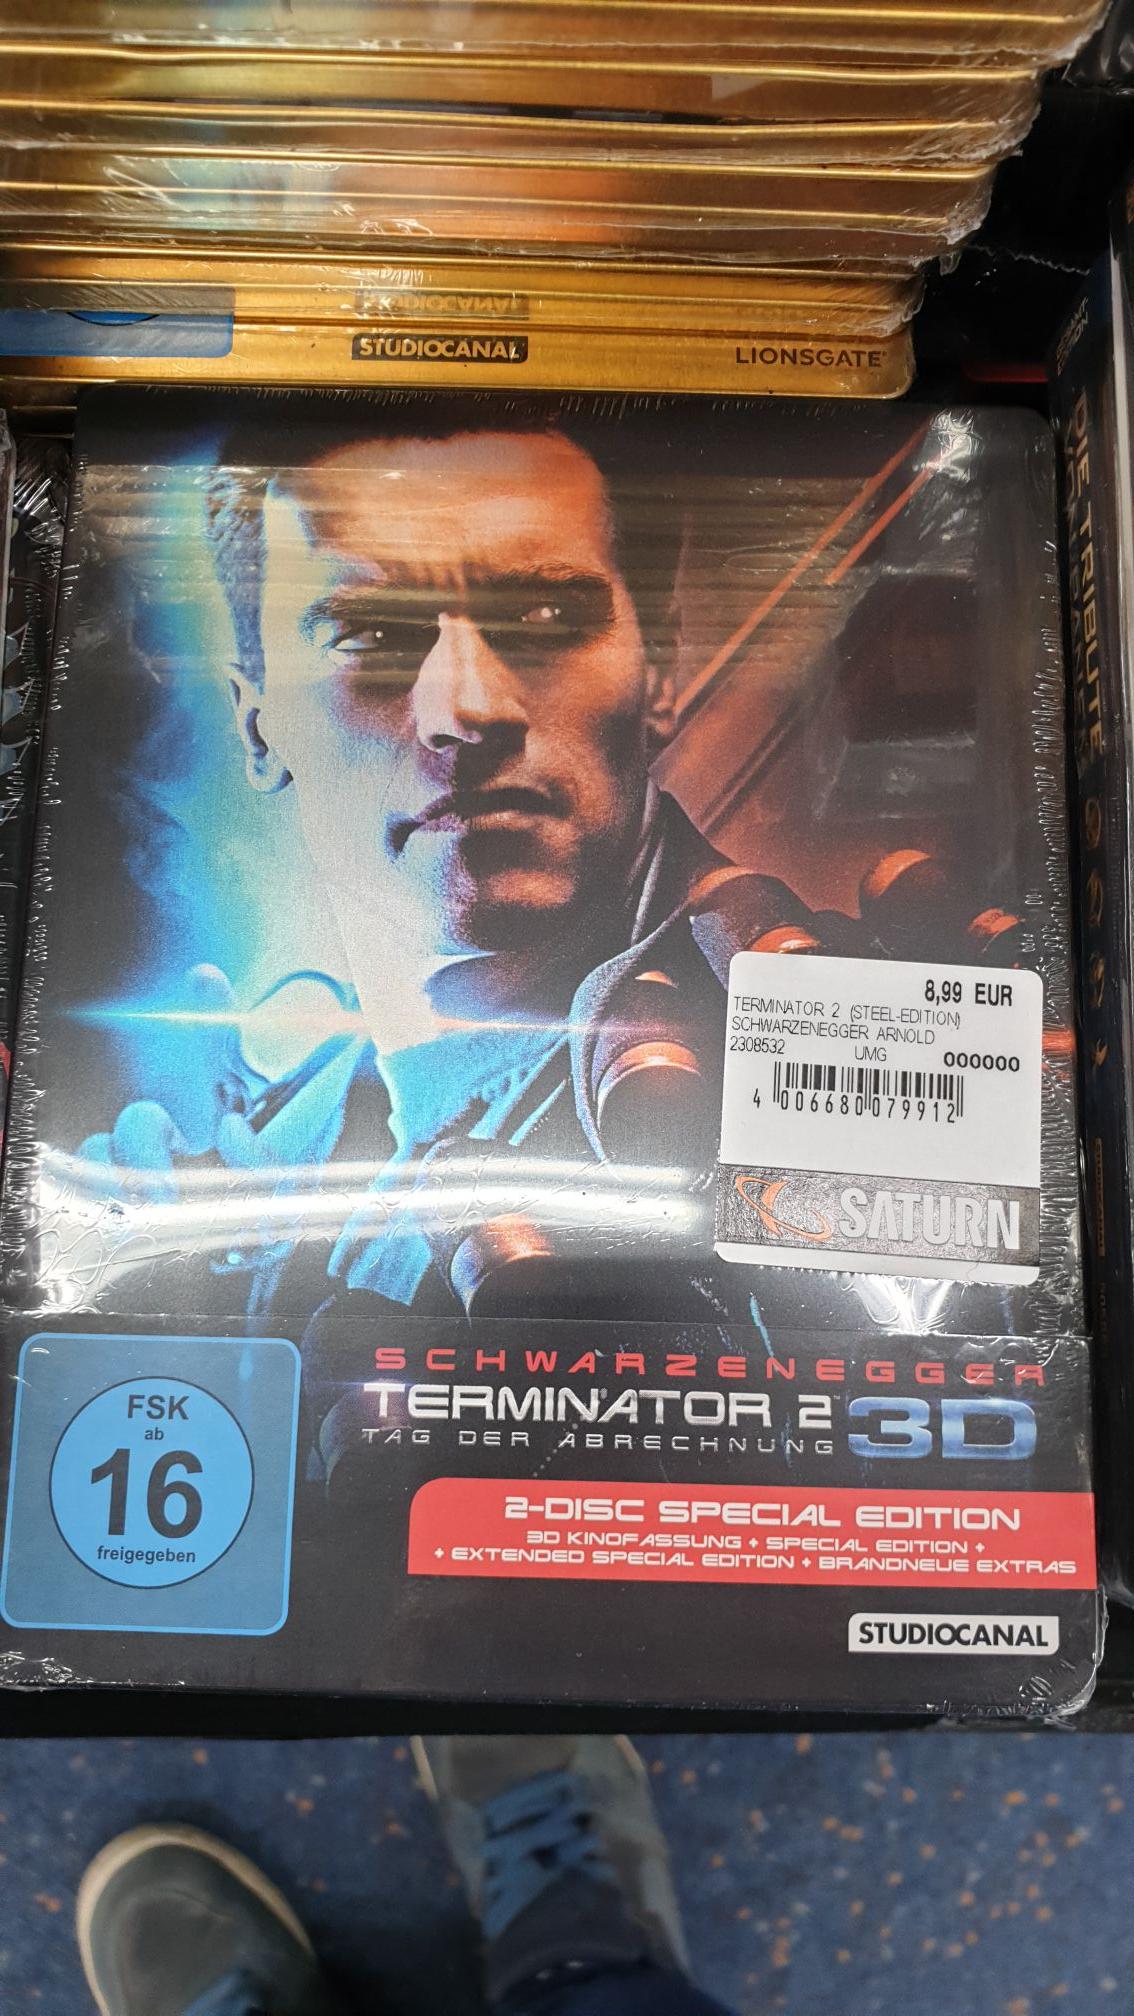 Terminator 2 3D - Saturn in Essen /Limbeckerplatz [Lokal]